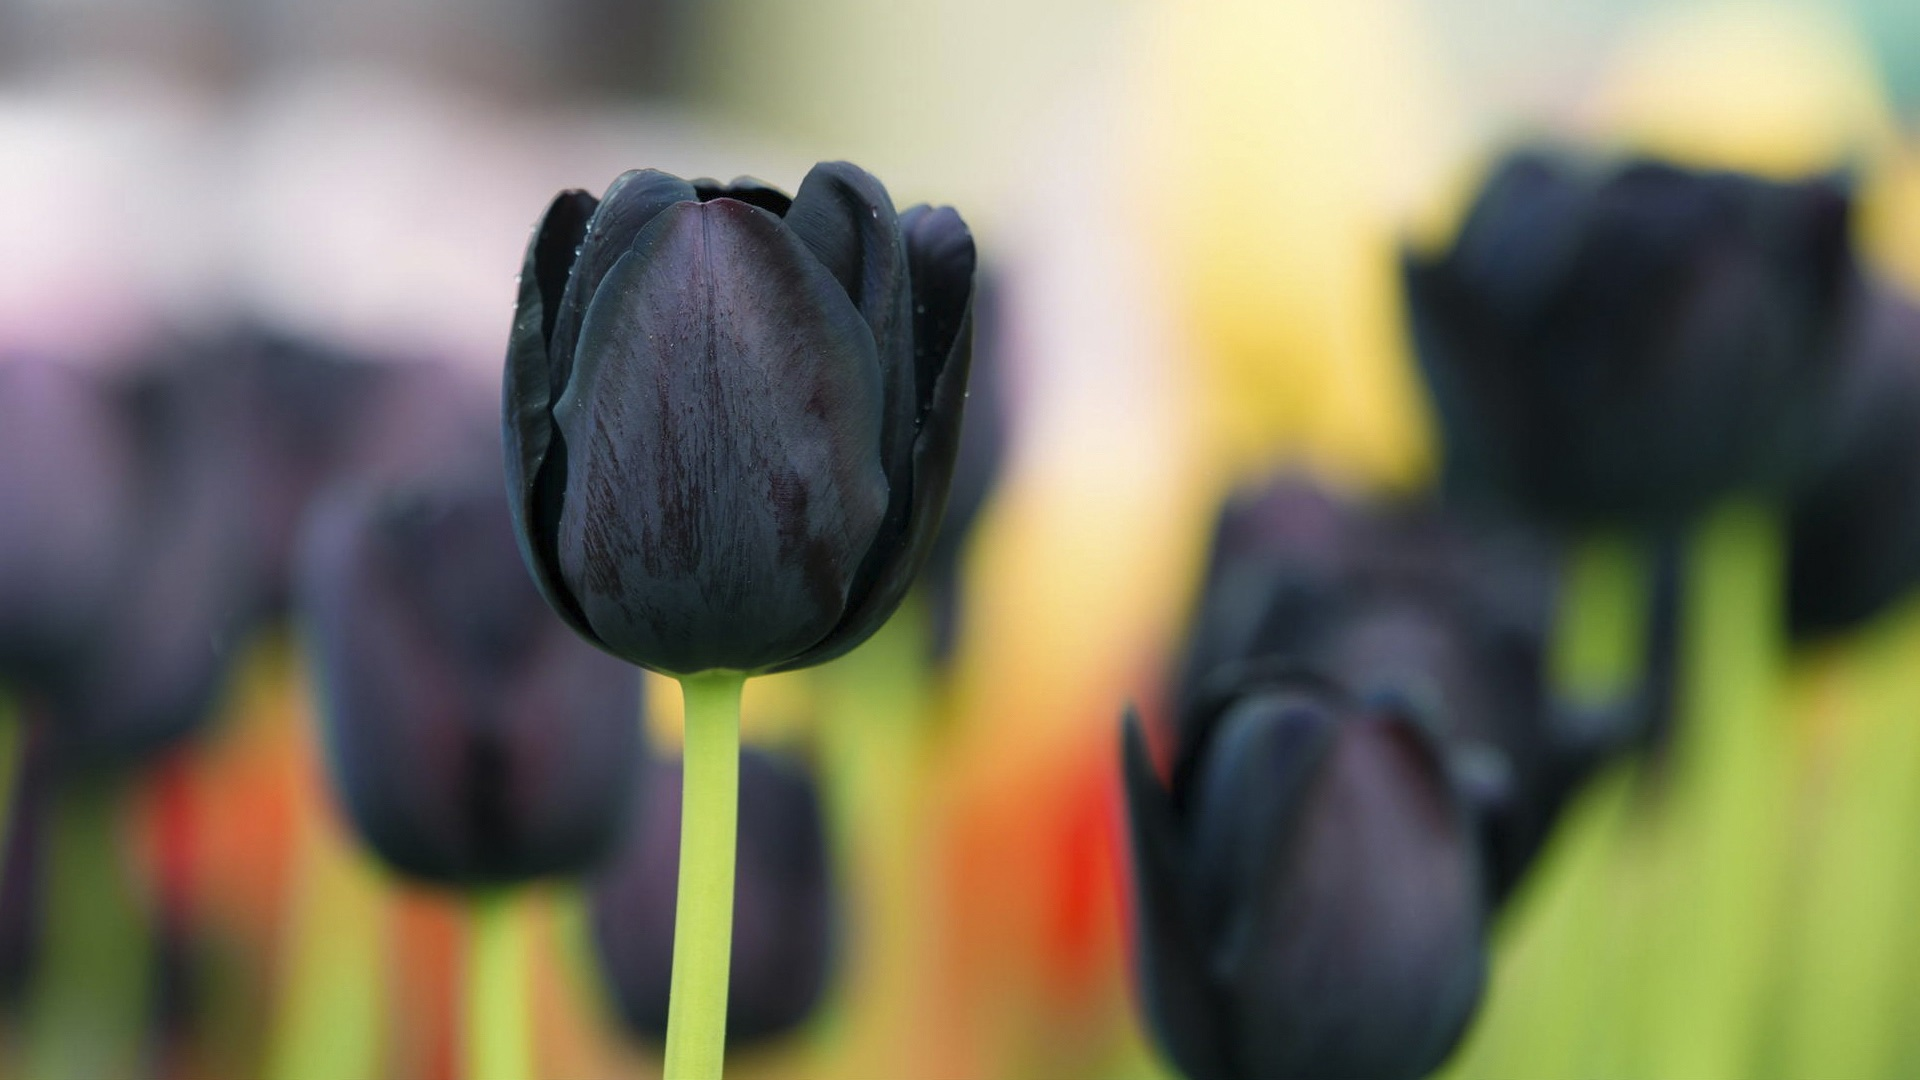 wallpaper black tulip flowers 1920x1080 full hd 2k picture image